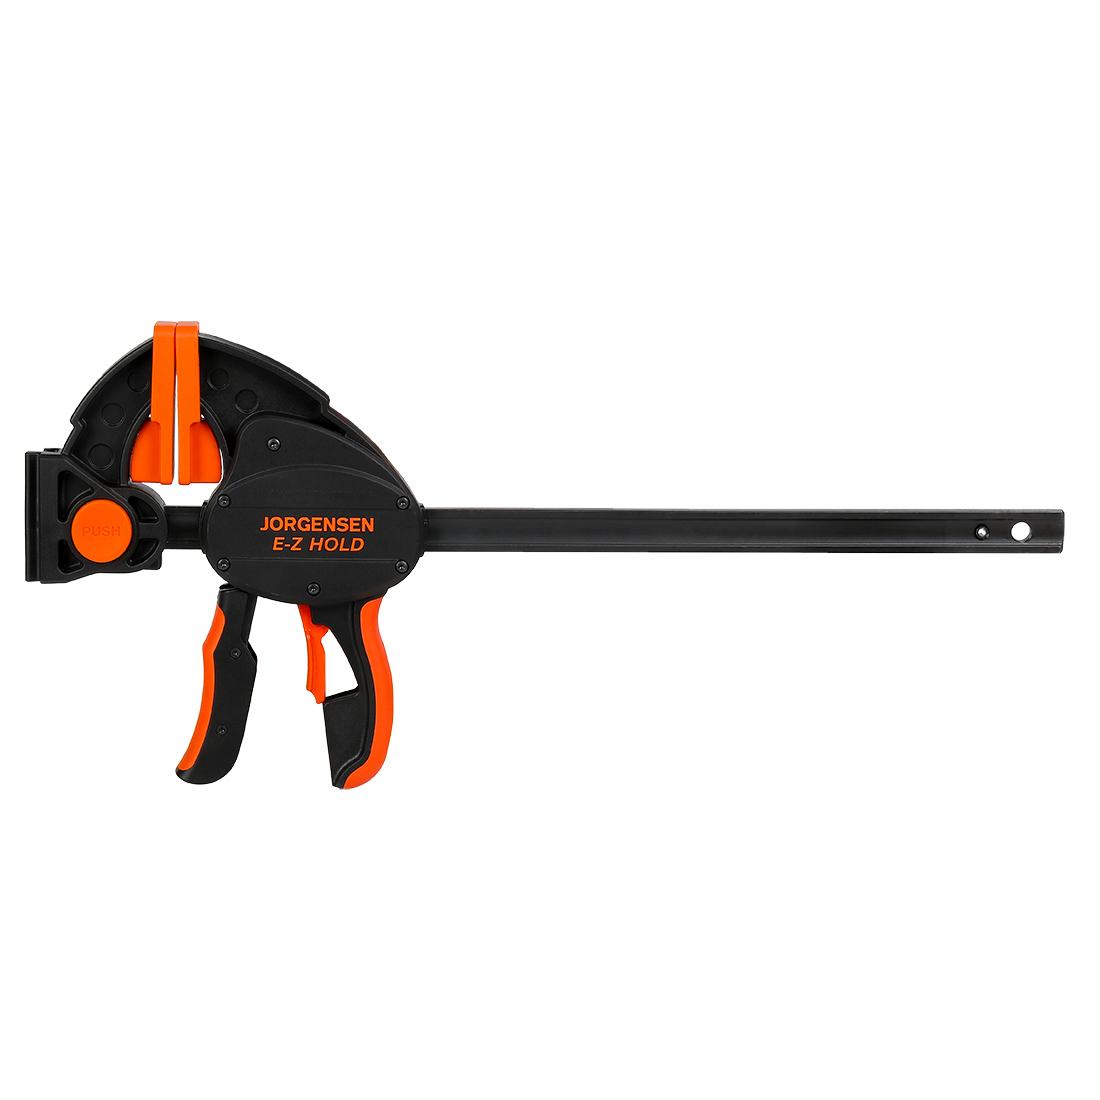 E-Z Hold Bar Clamp Heavy Duty 300mm - 272kg AJP33712